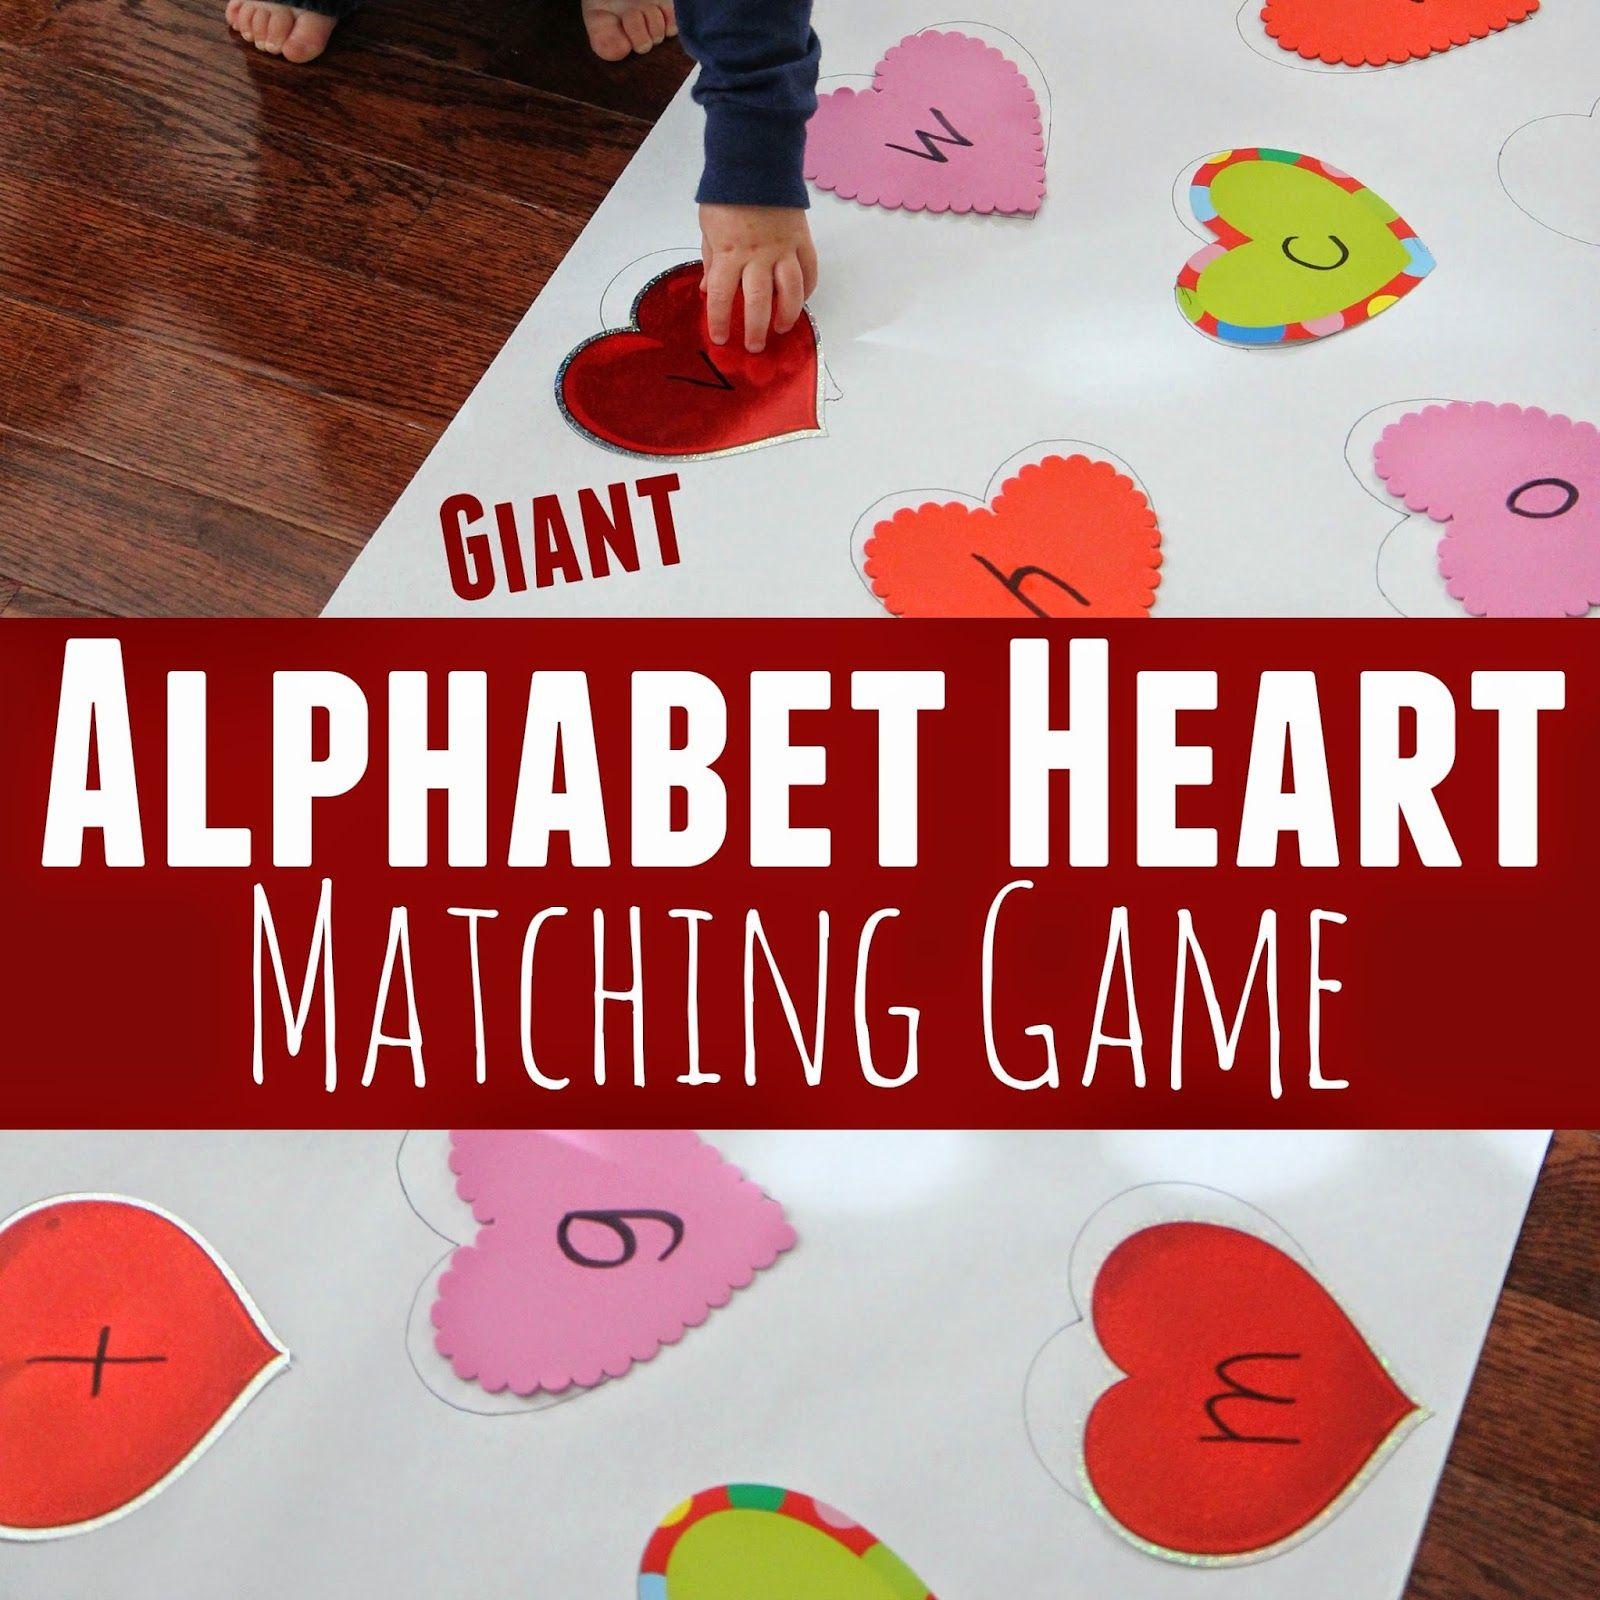 Giant Alphabet Heart Matching Game